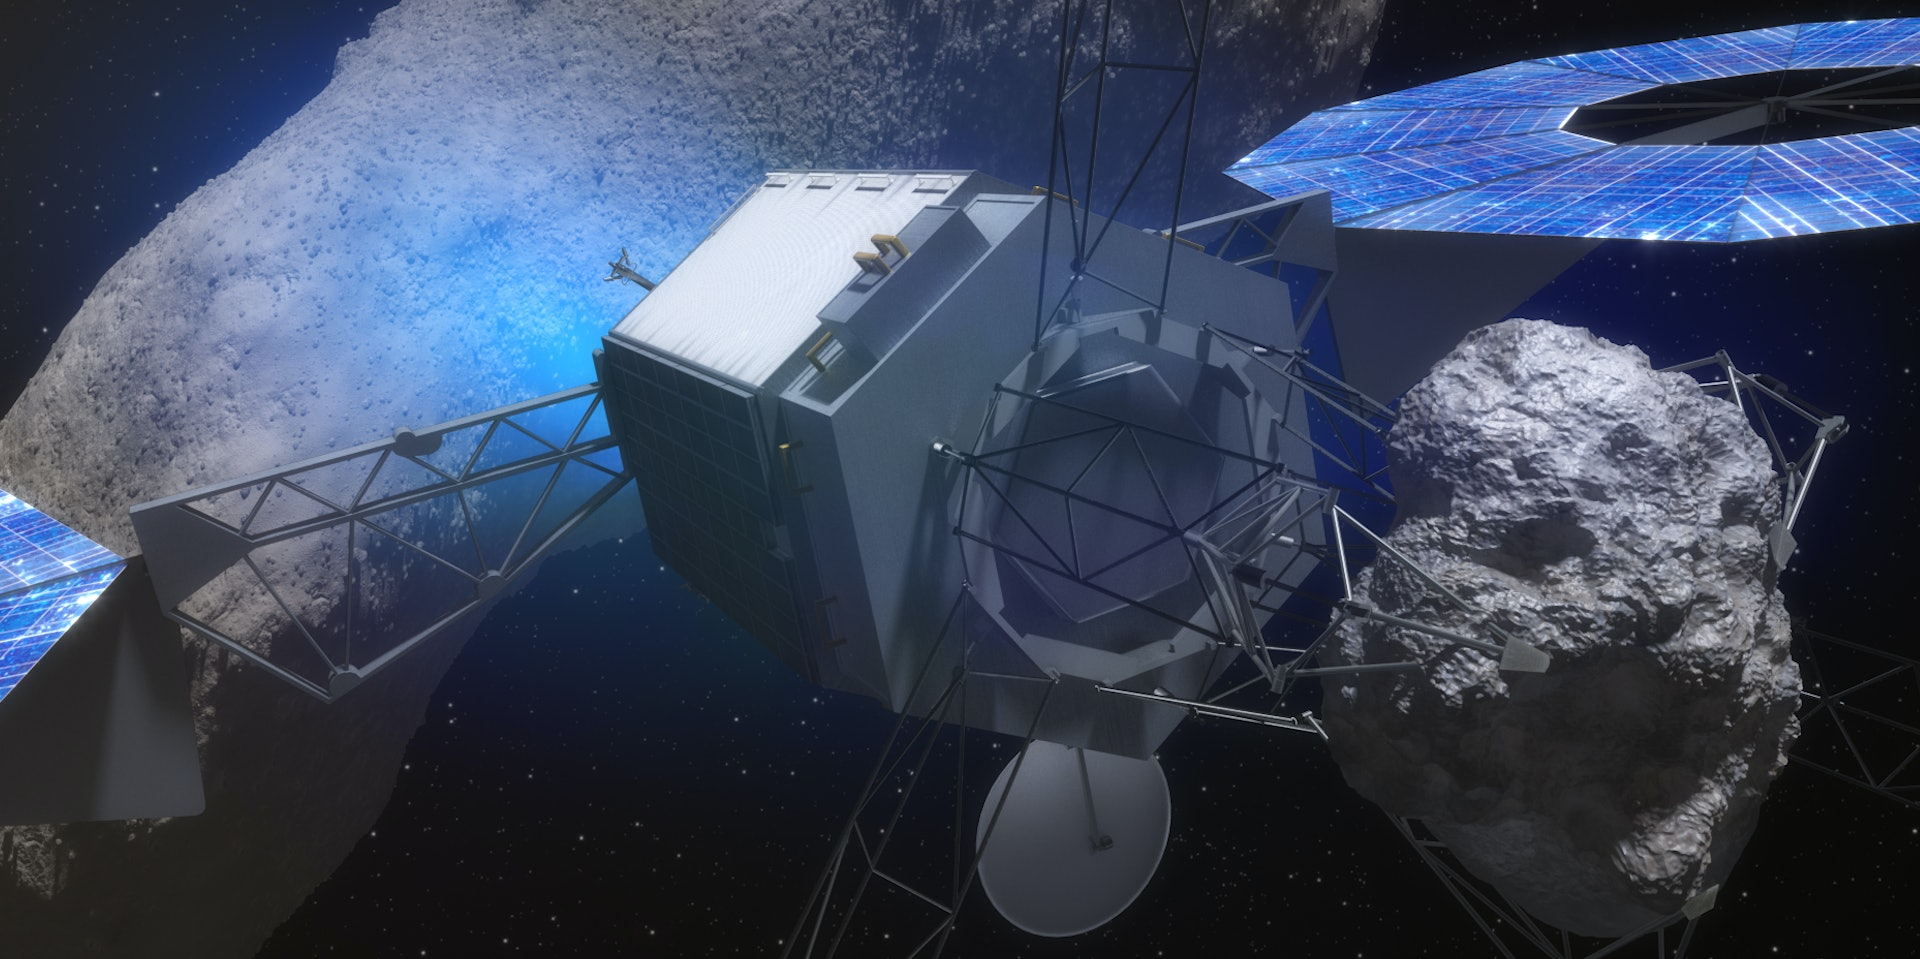 NASA asteroid redirect mission